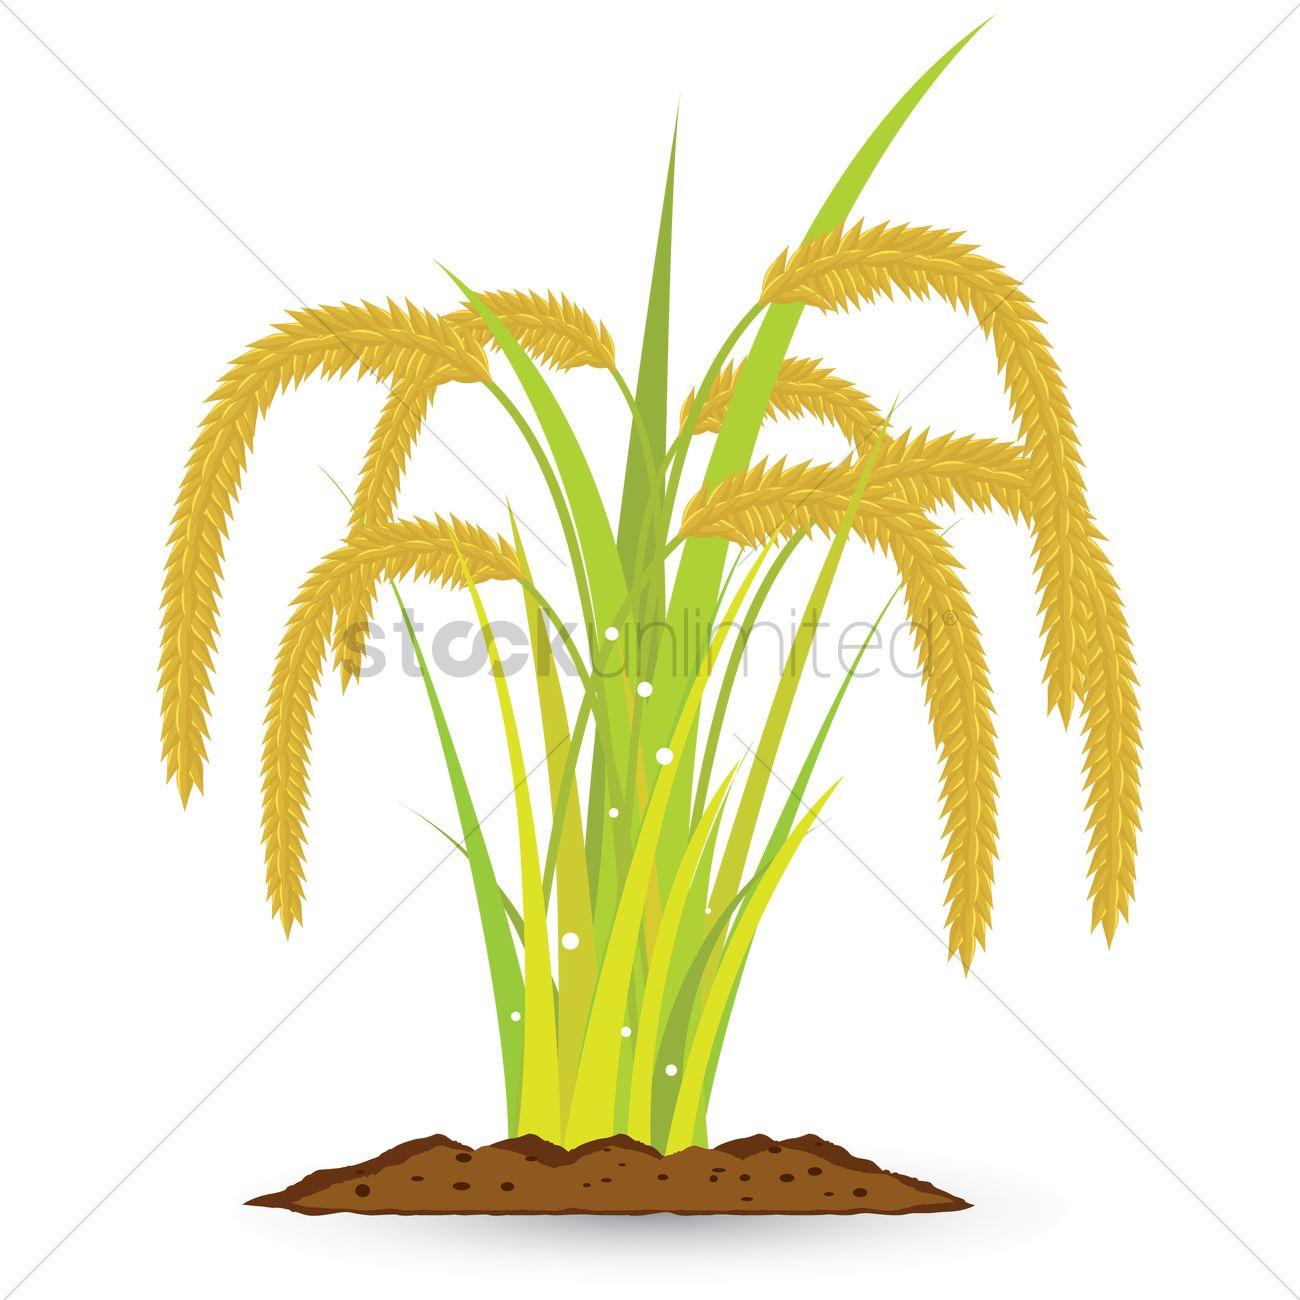 1300x1300 Grain Clipart Wheat Plant